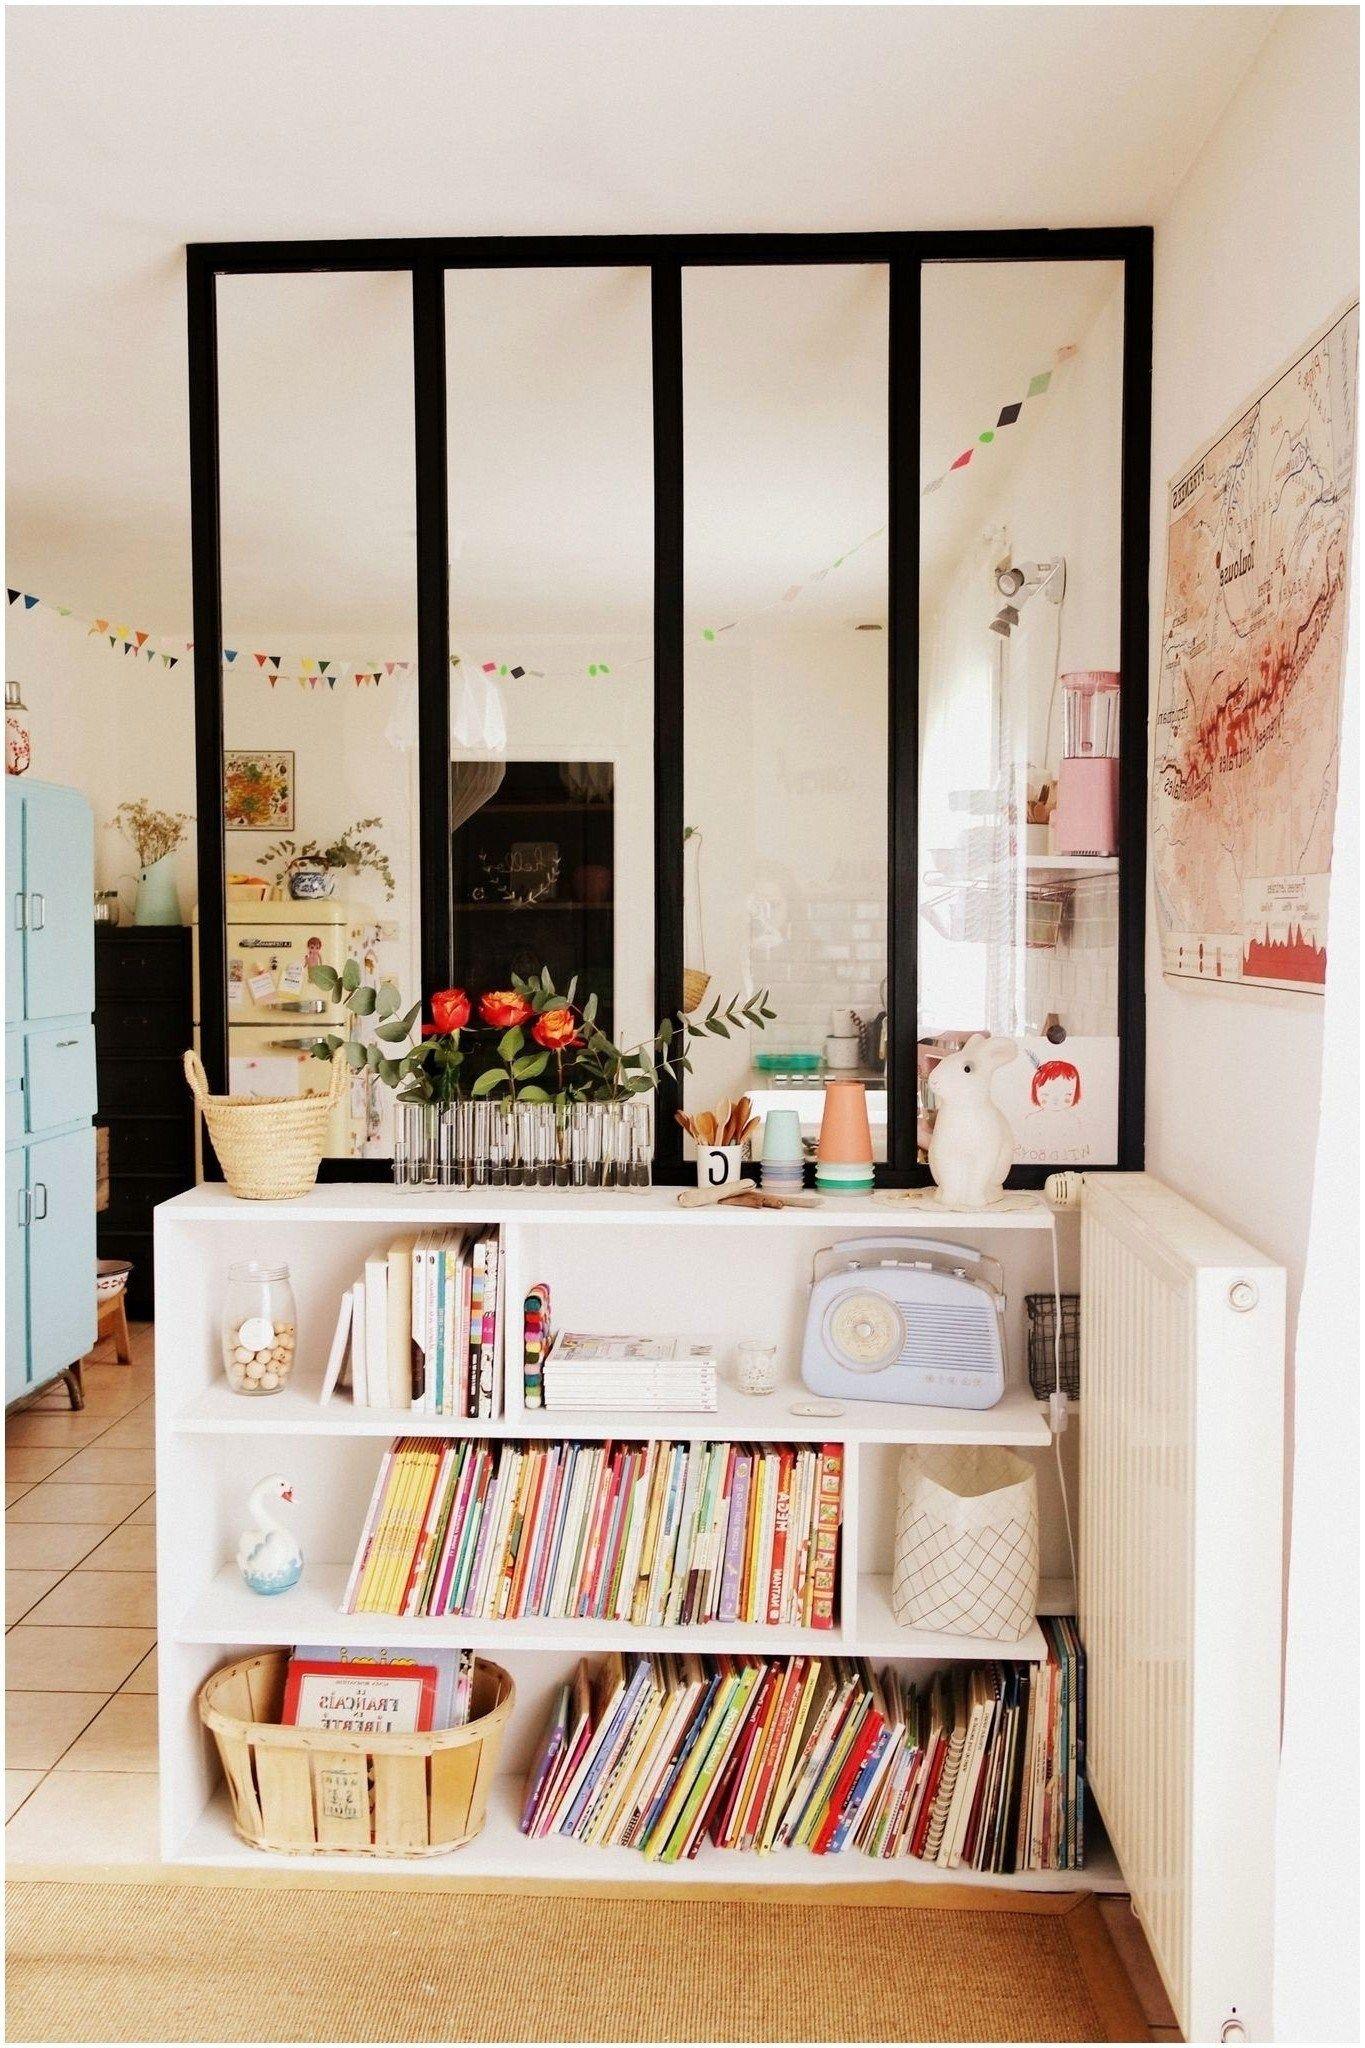 Elegant Bar De Separation Cuisine  Home, Front room, Interior